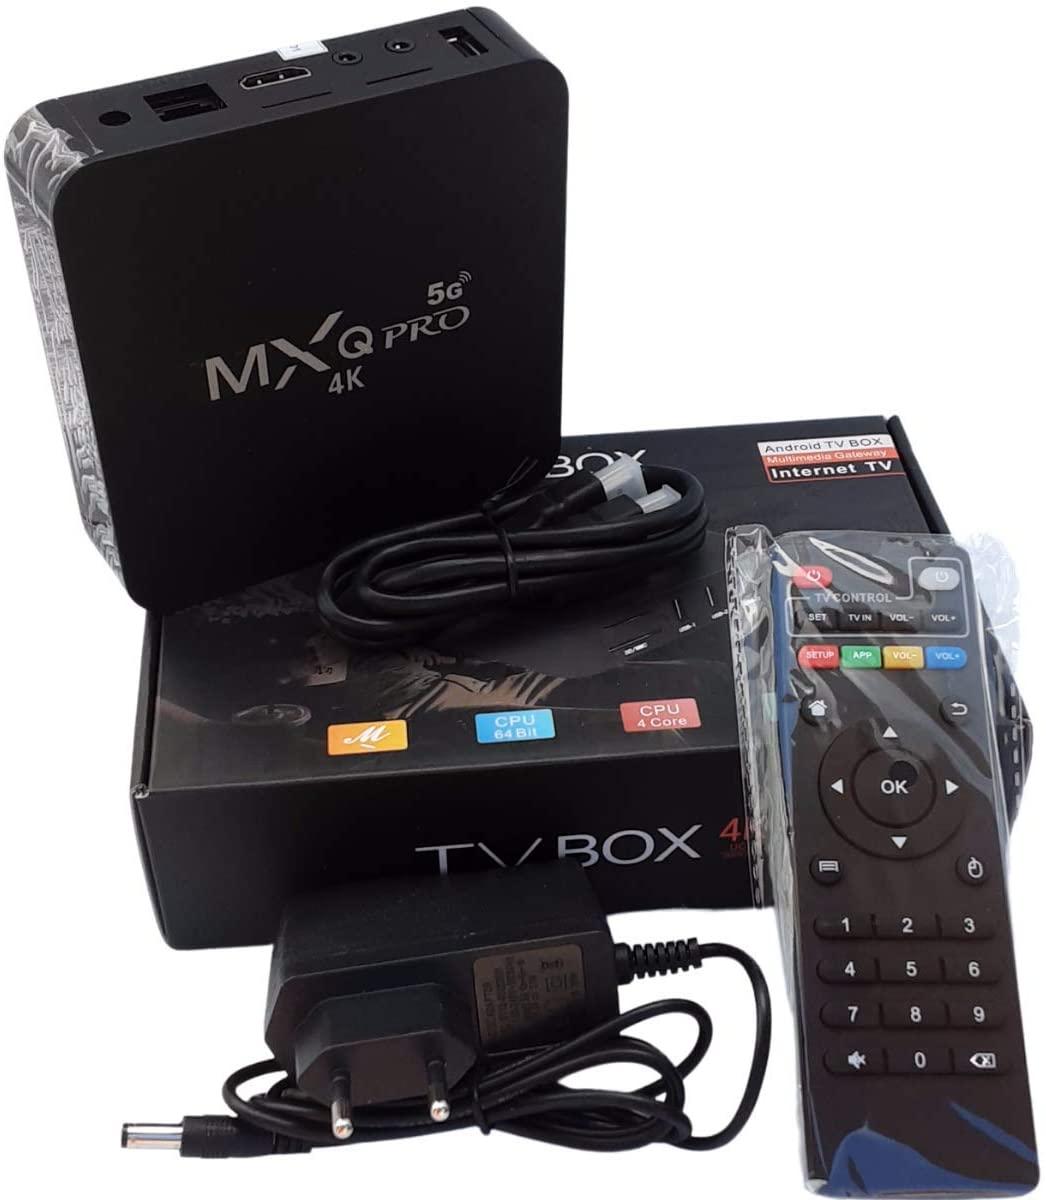 Conversor 4K Ultra HD 128GB 5g e wifi + Controle + Cabo hdmi + Garantia e Nota Fiscal